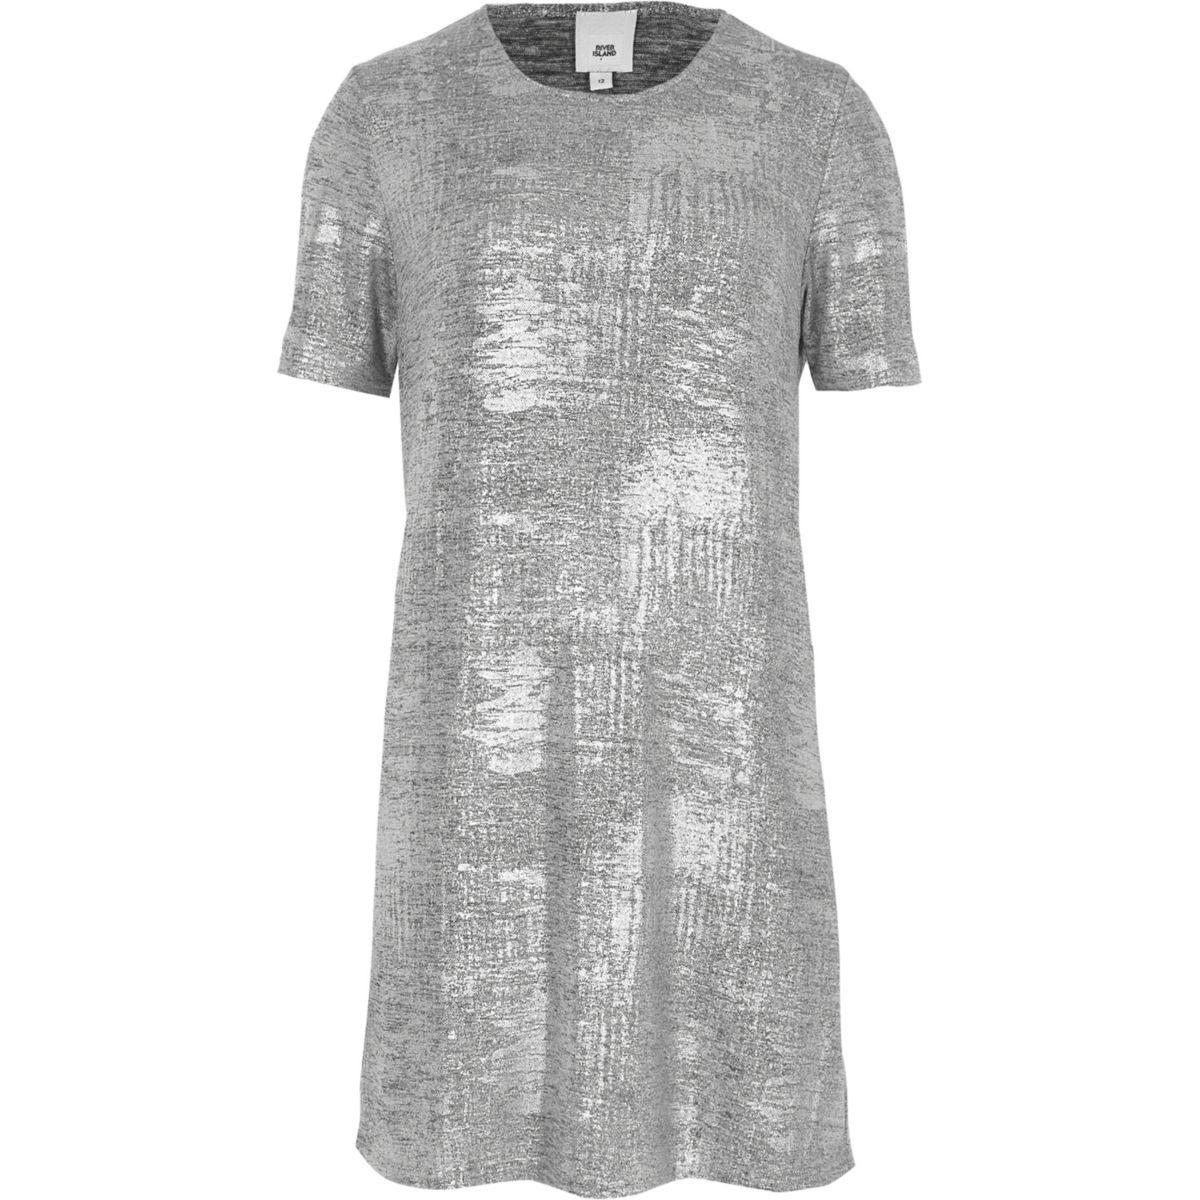 Silver metallic foil T-shirt dress